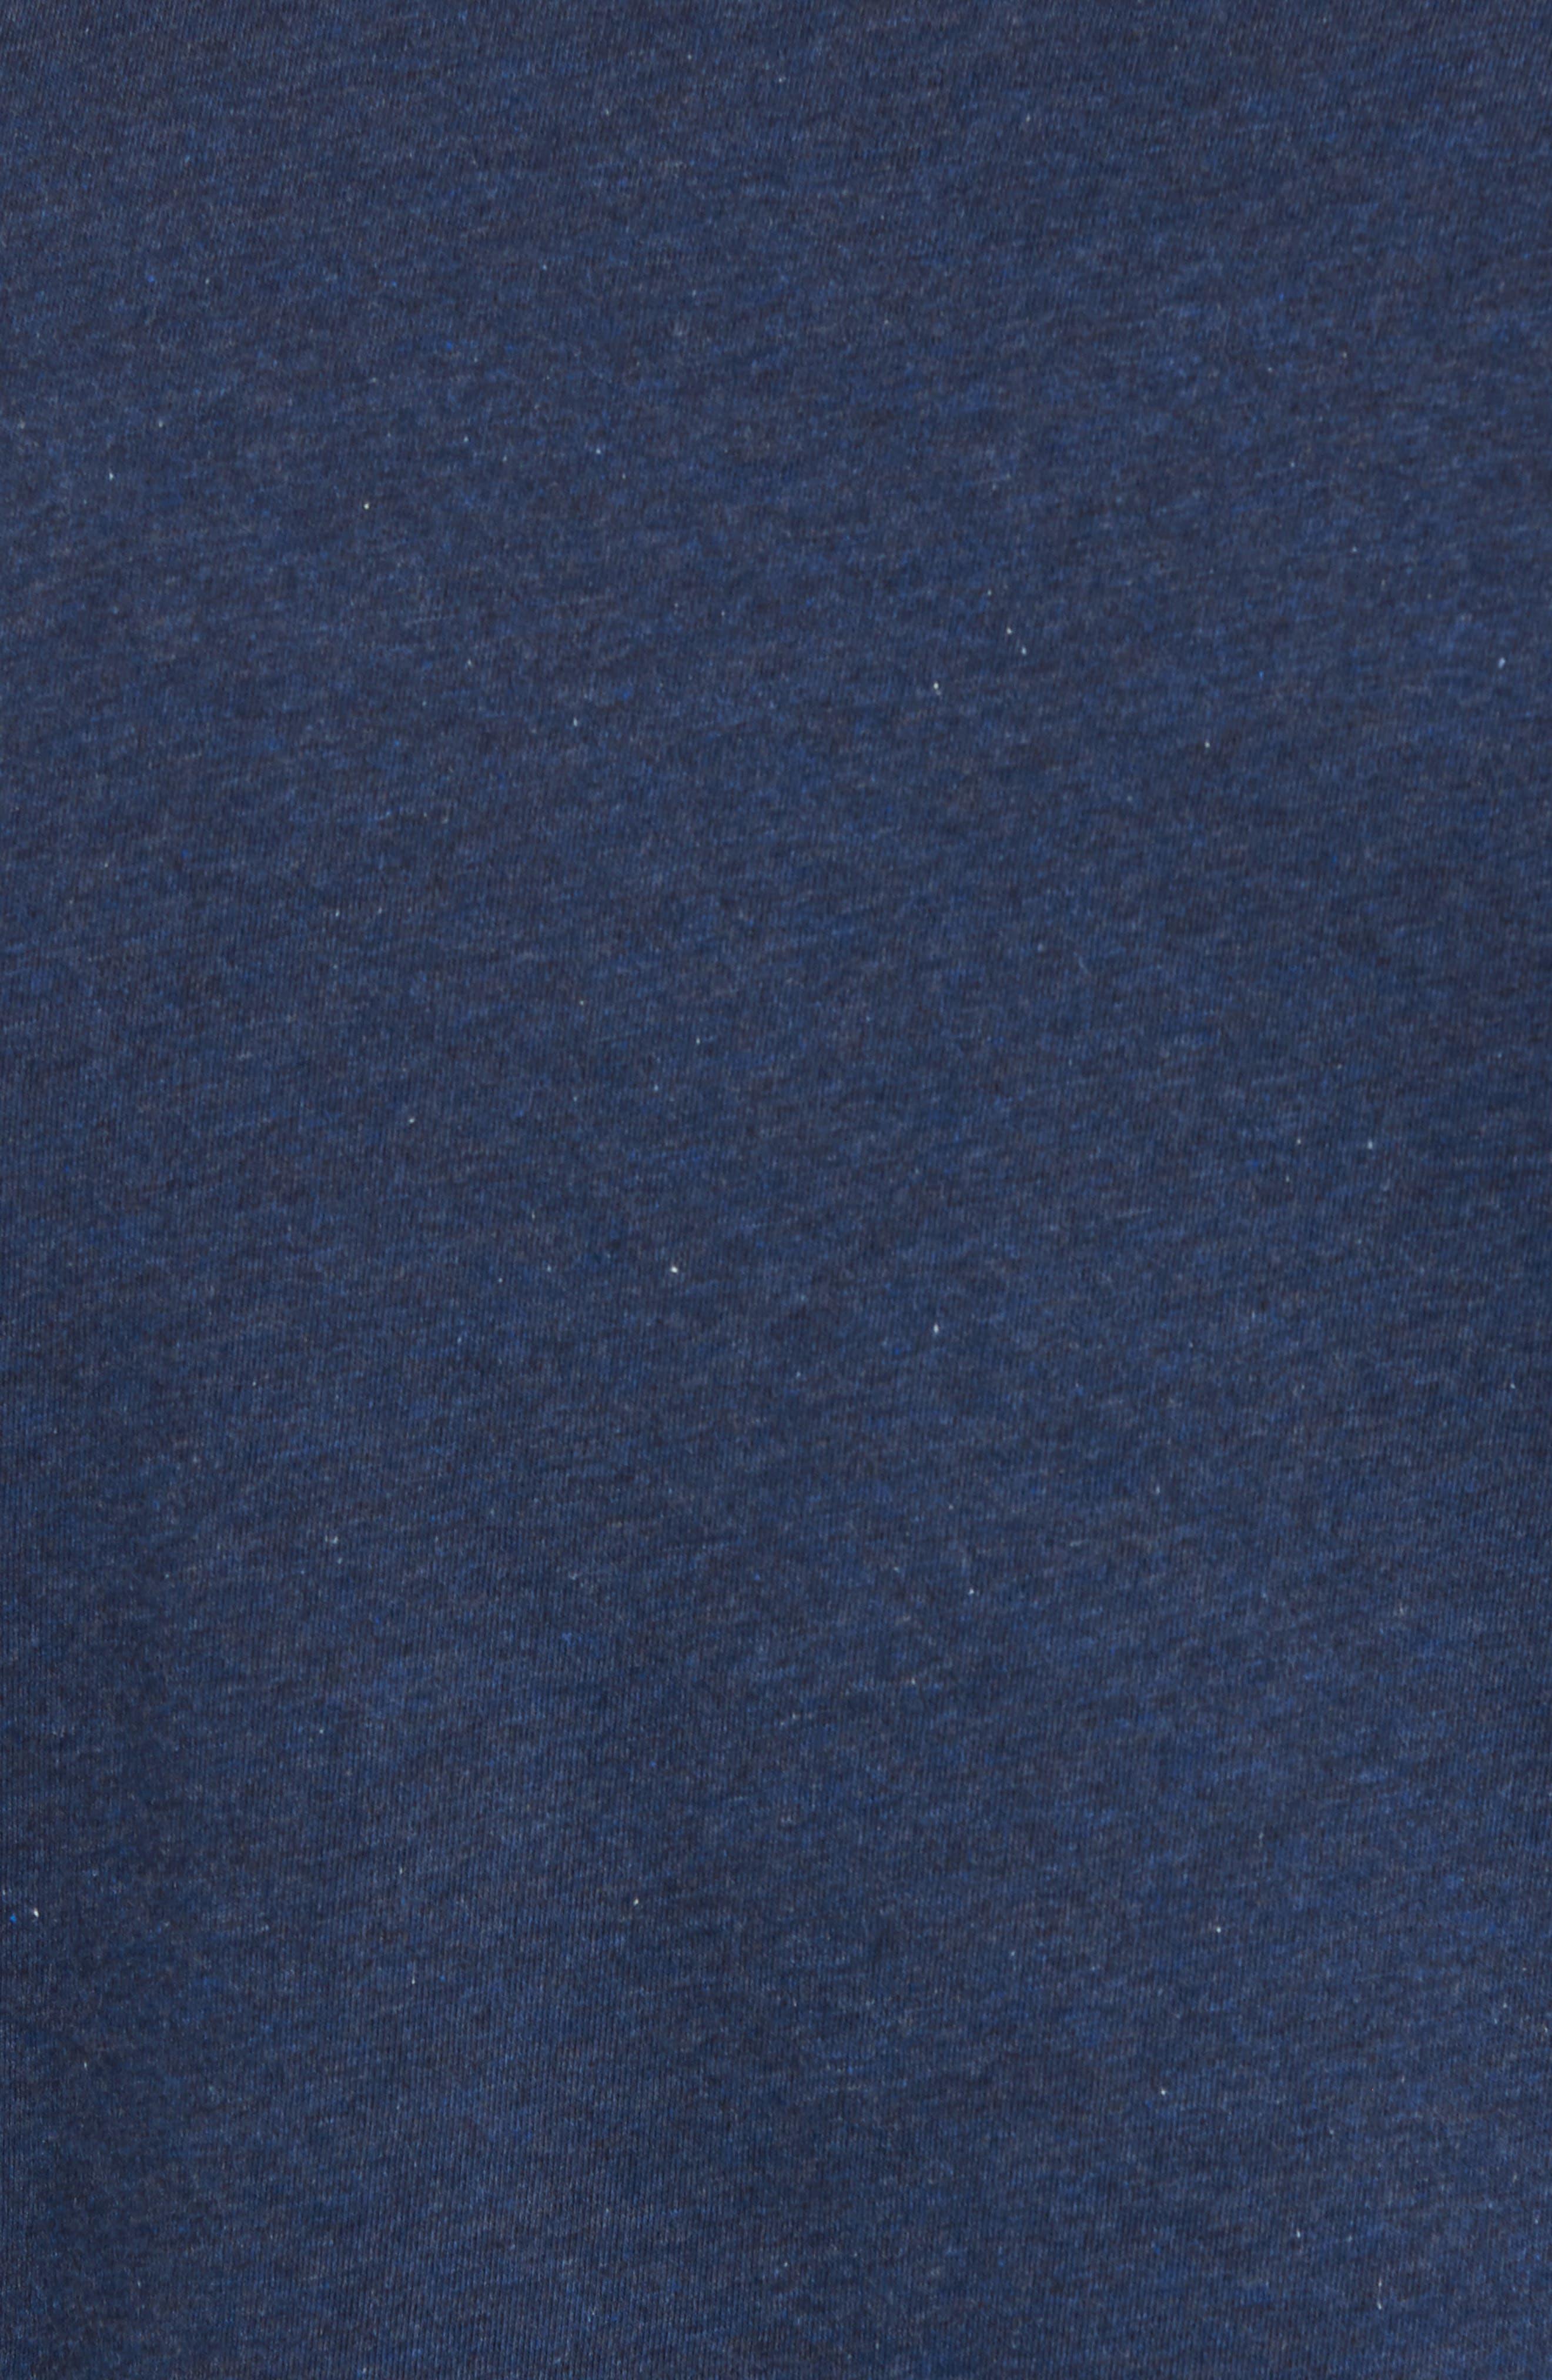 Bogue Pocket T-Shirt,                             Alternate thumbnail 5, color,                             Heather Blue Nights